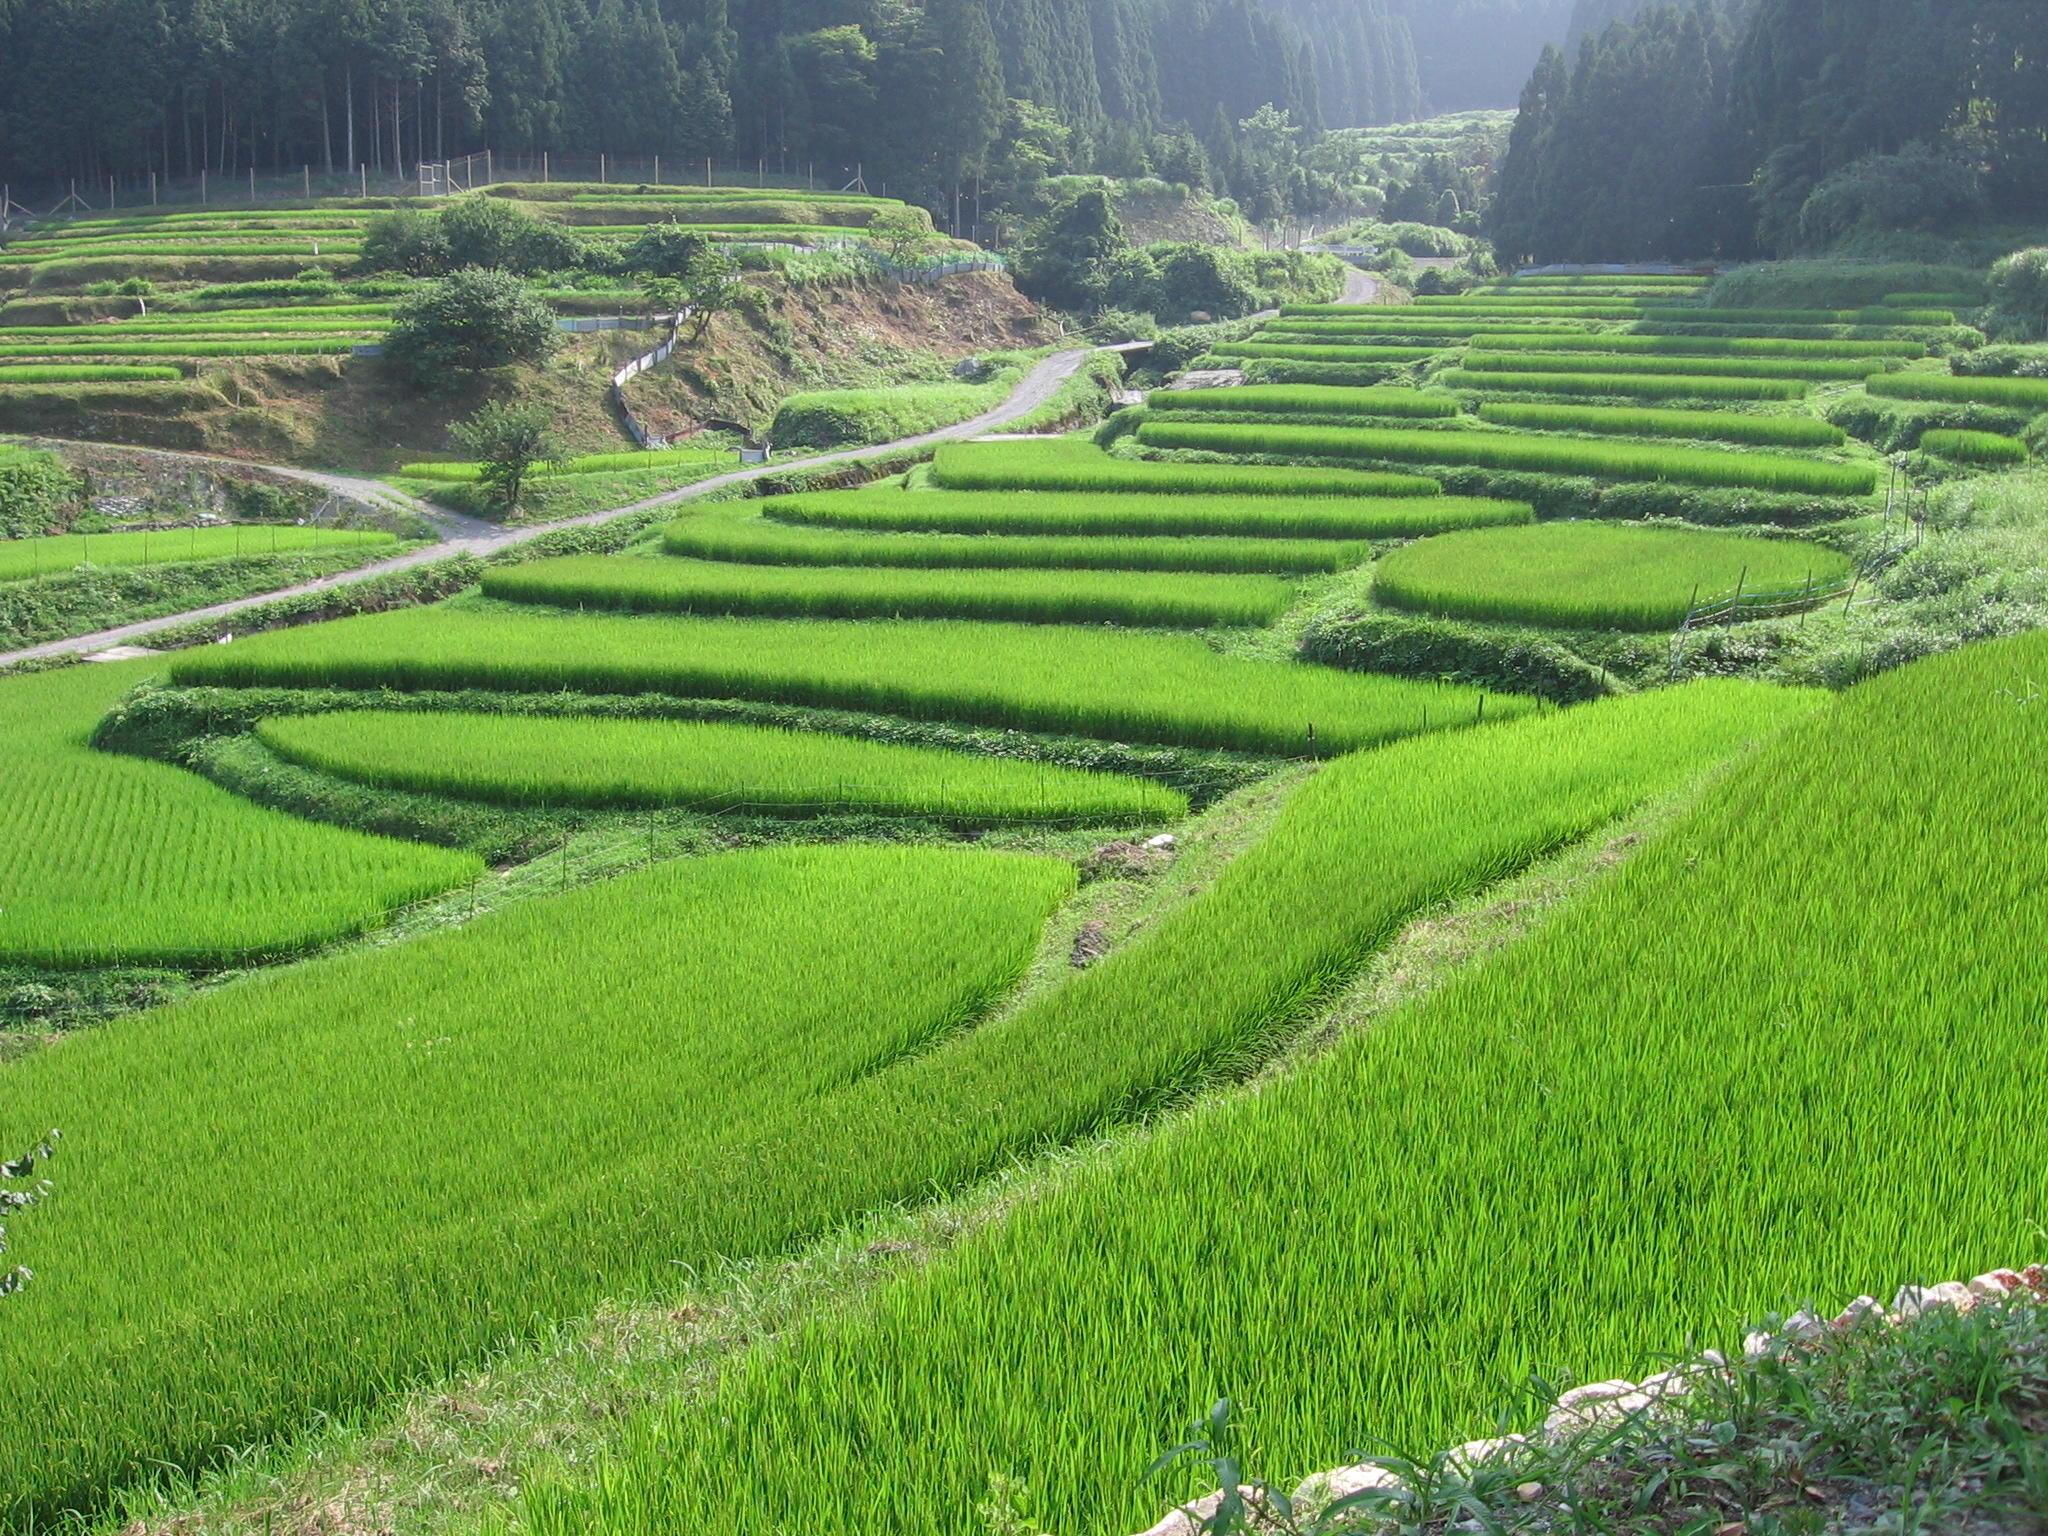 「滋賀県高島市畑:畑の棚田」の画像検索結果